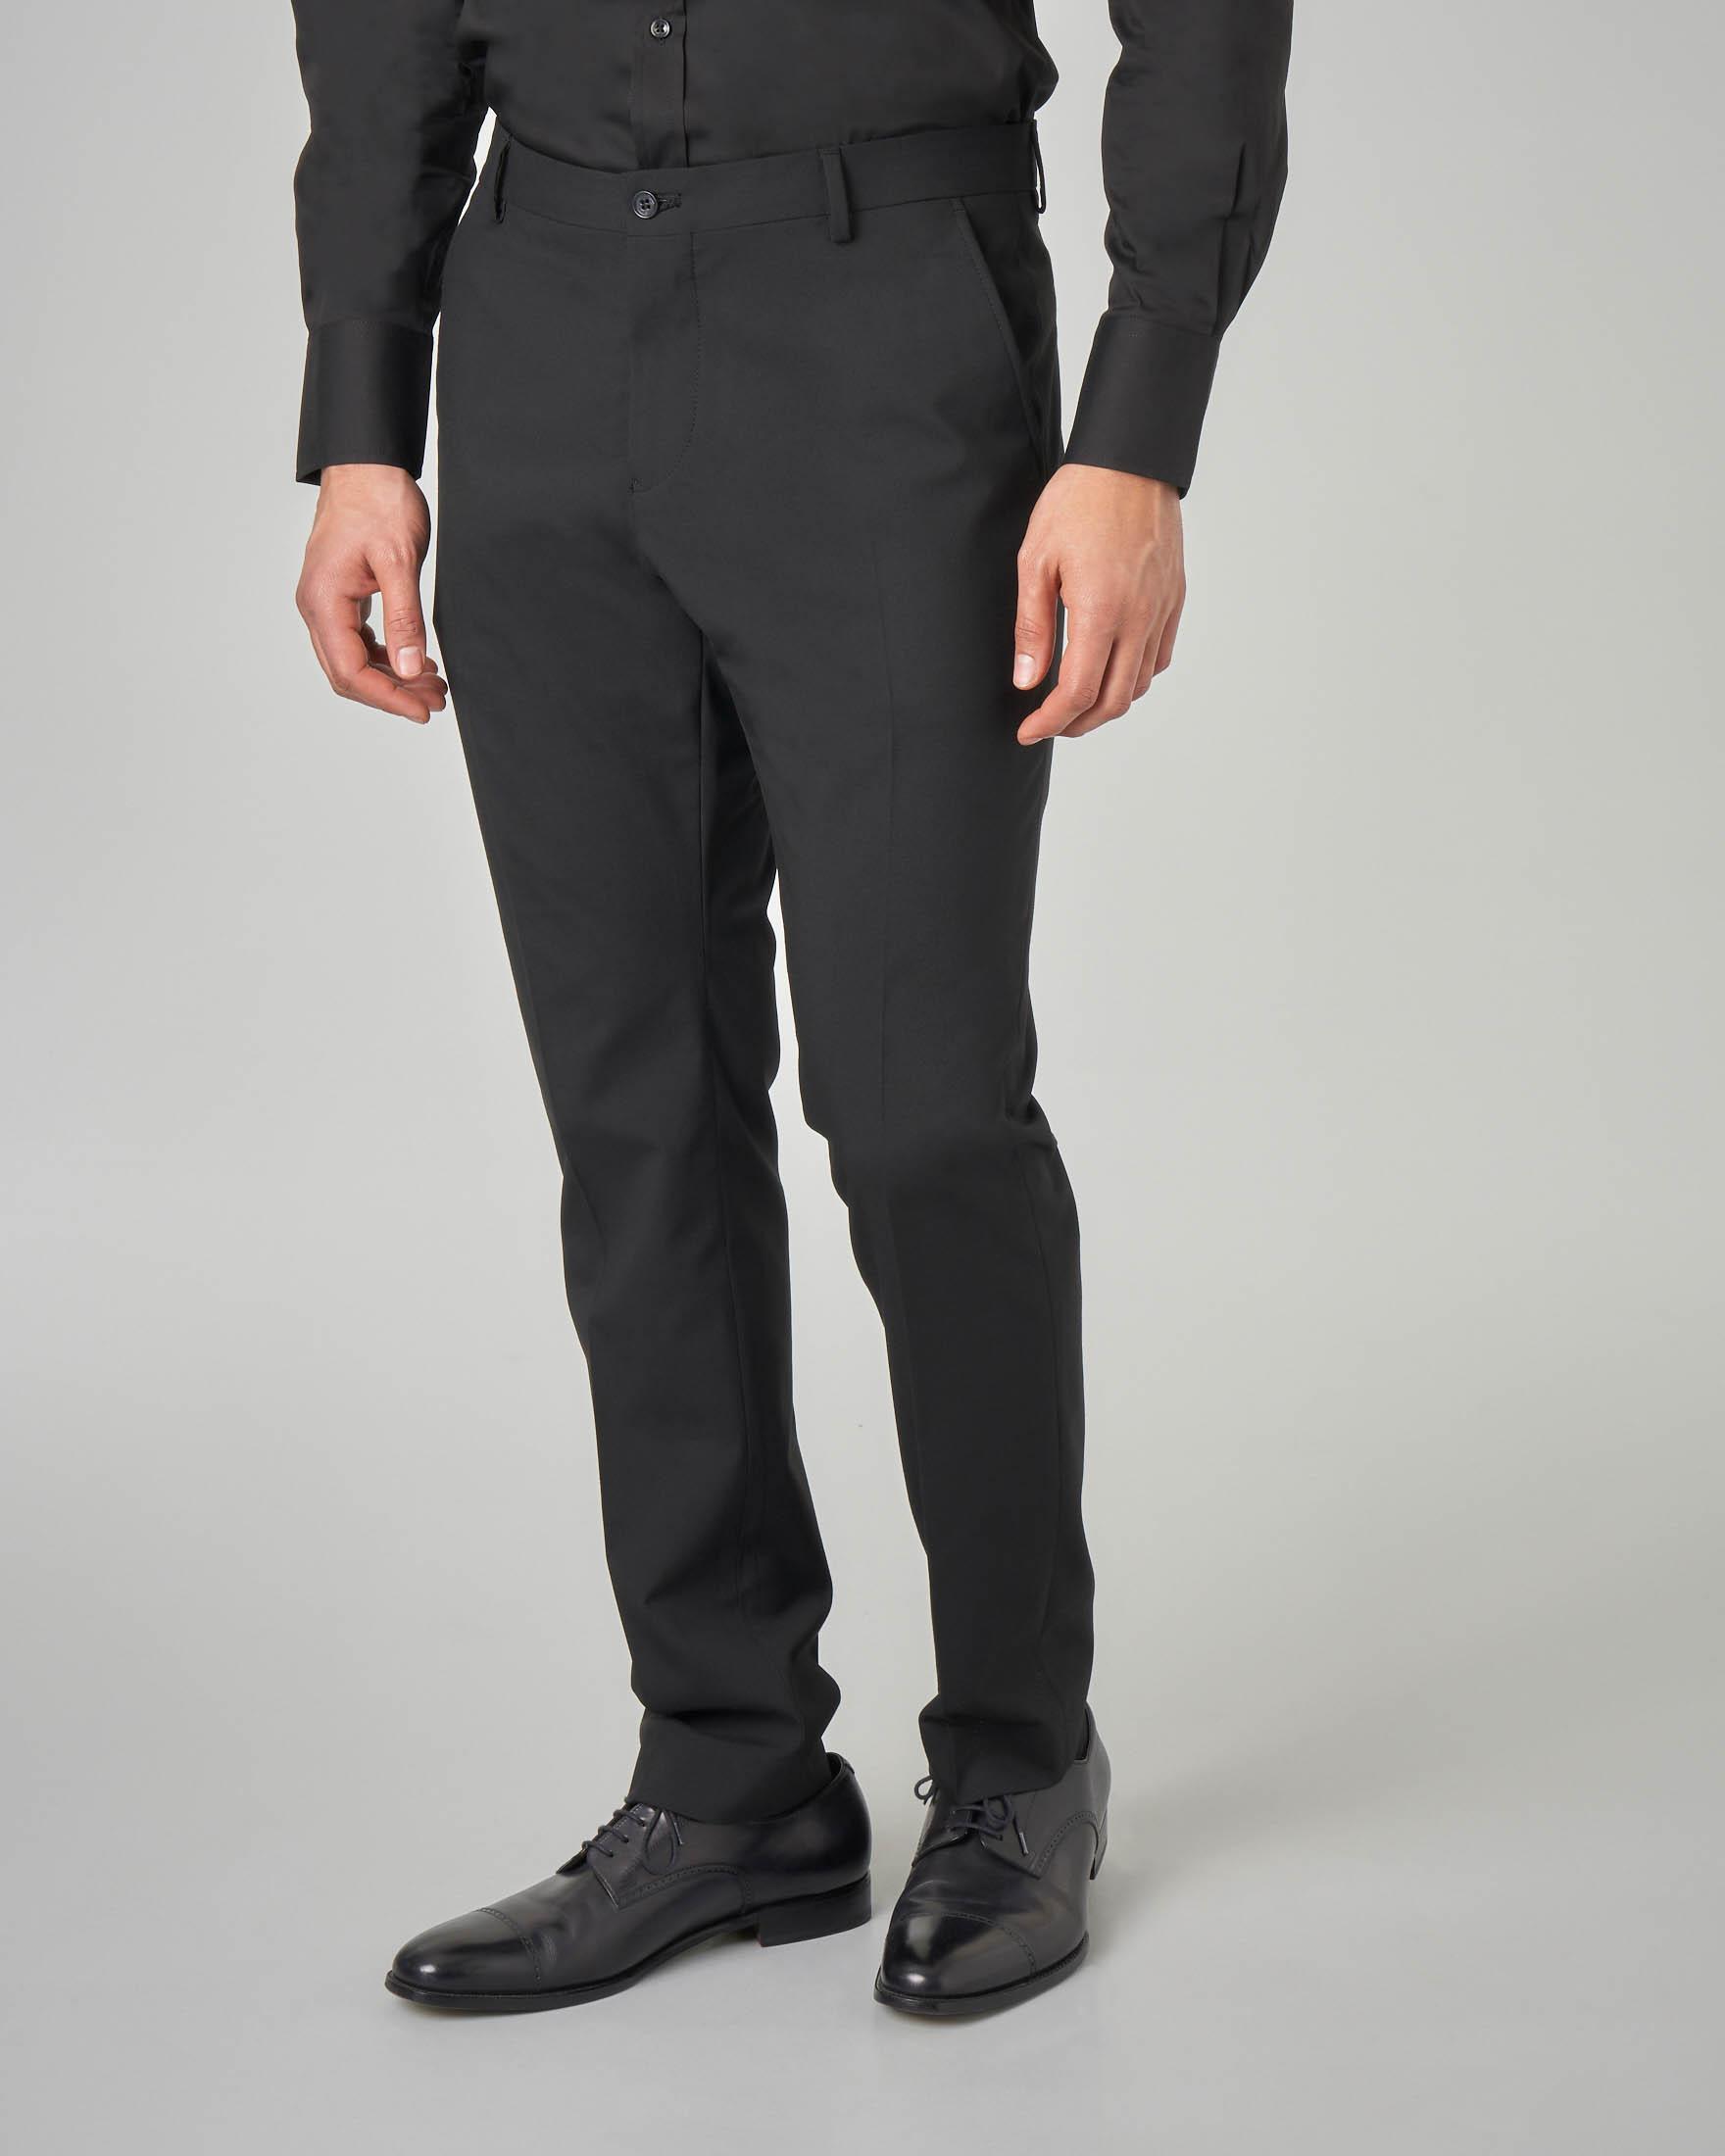 Pantalone nero tinta unita